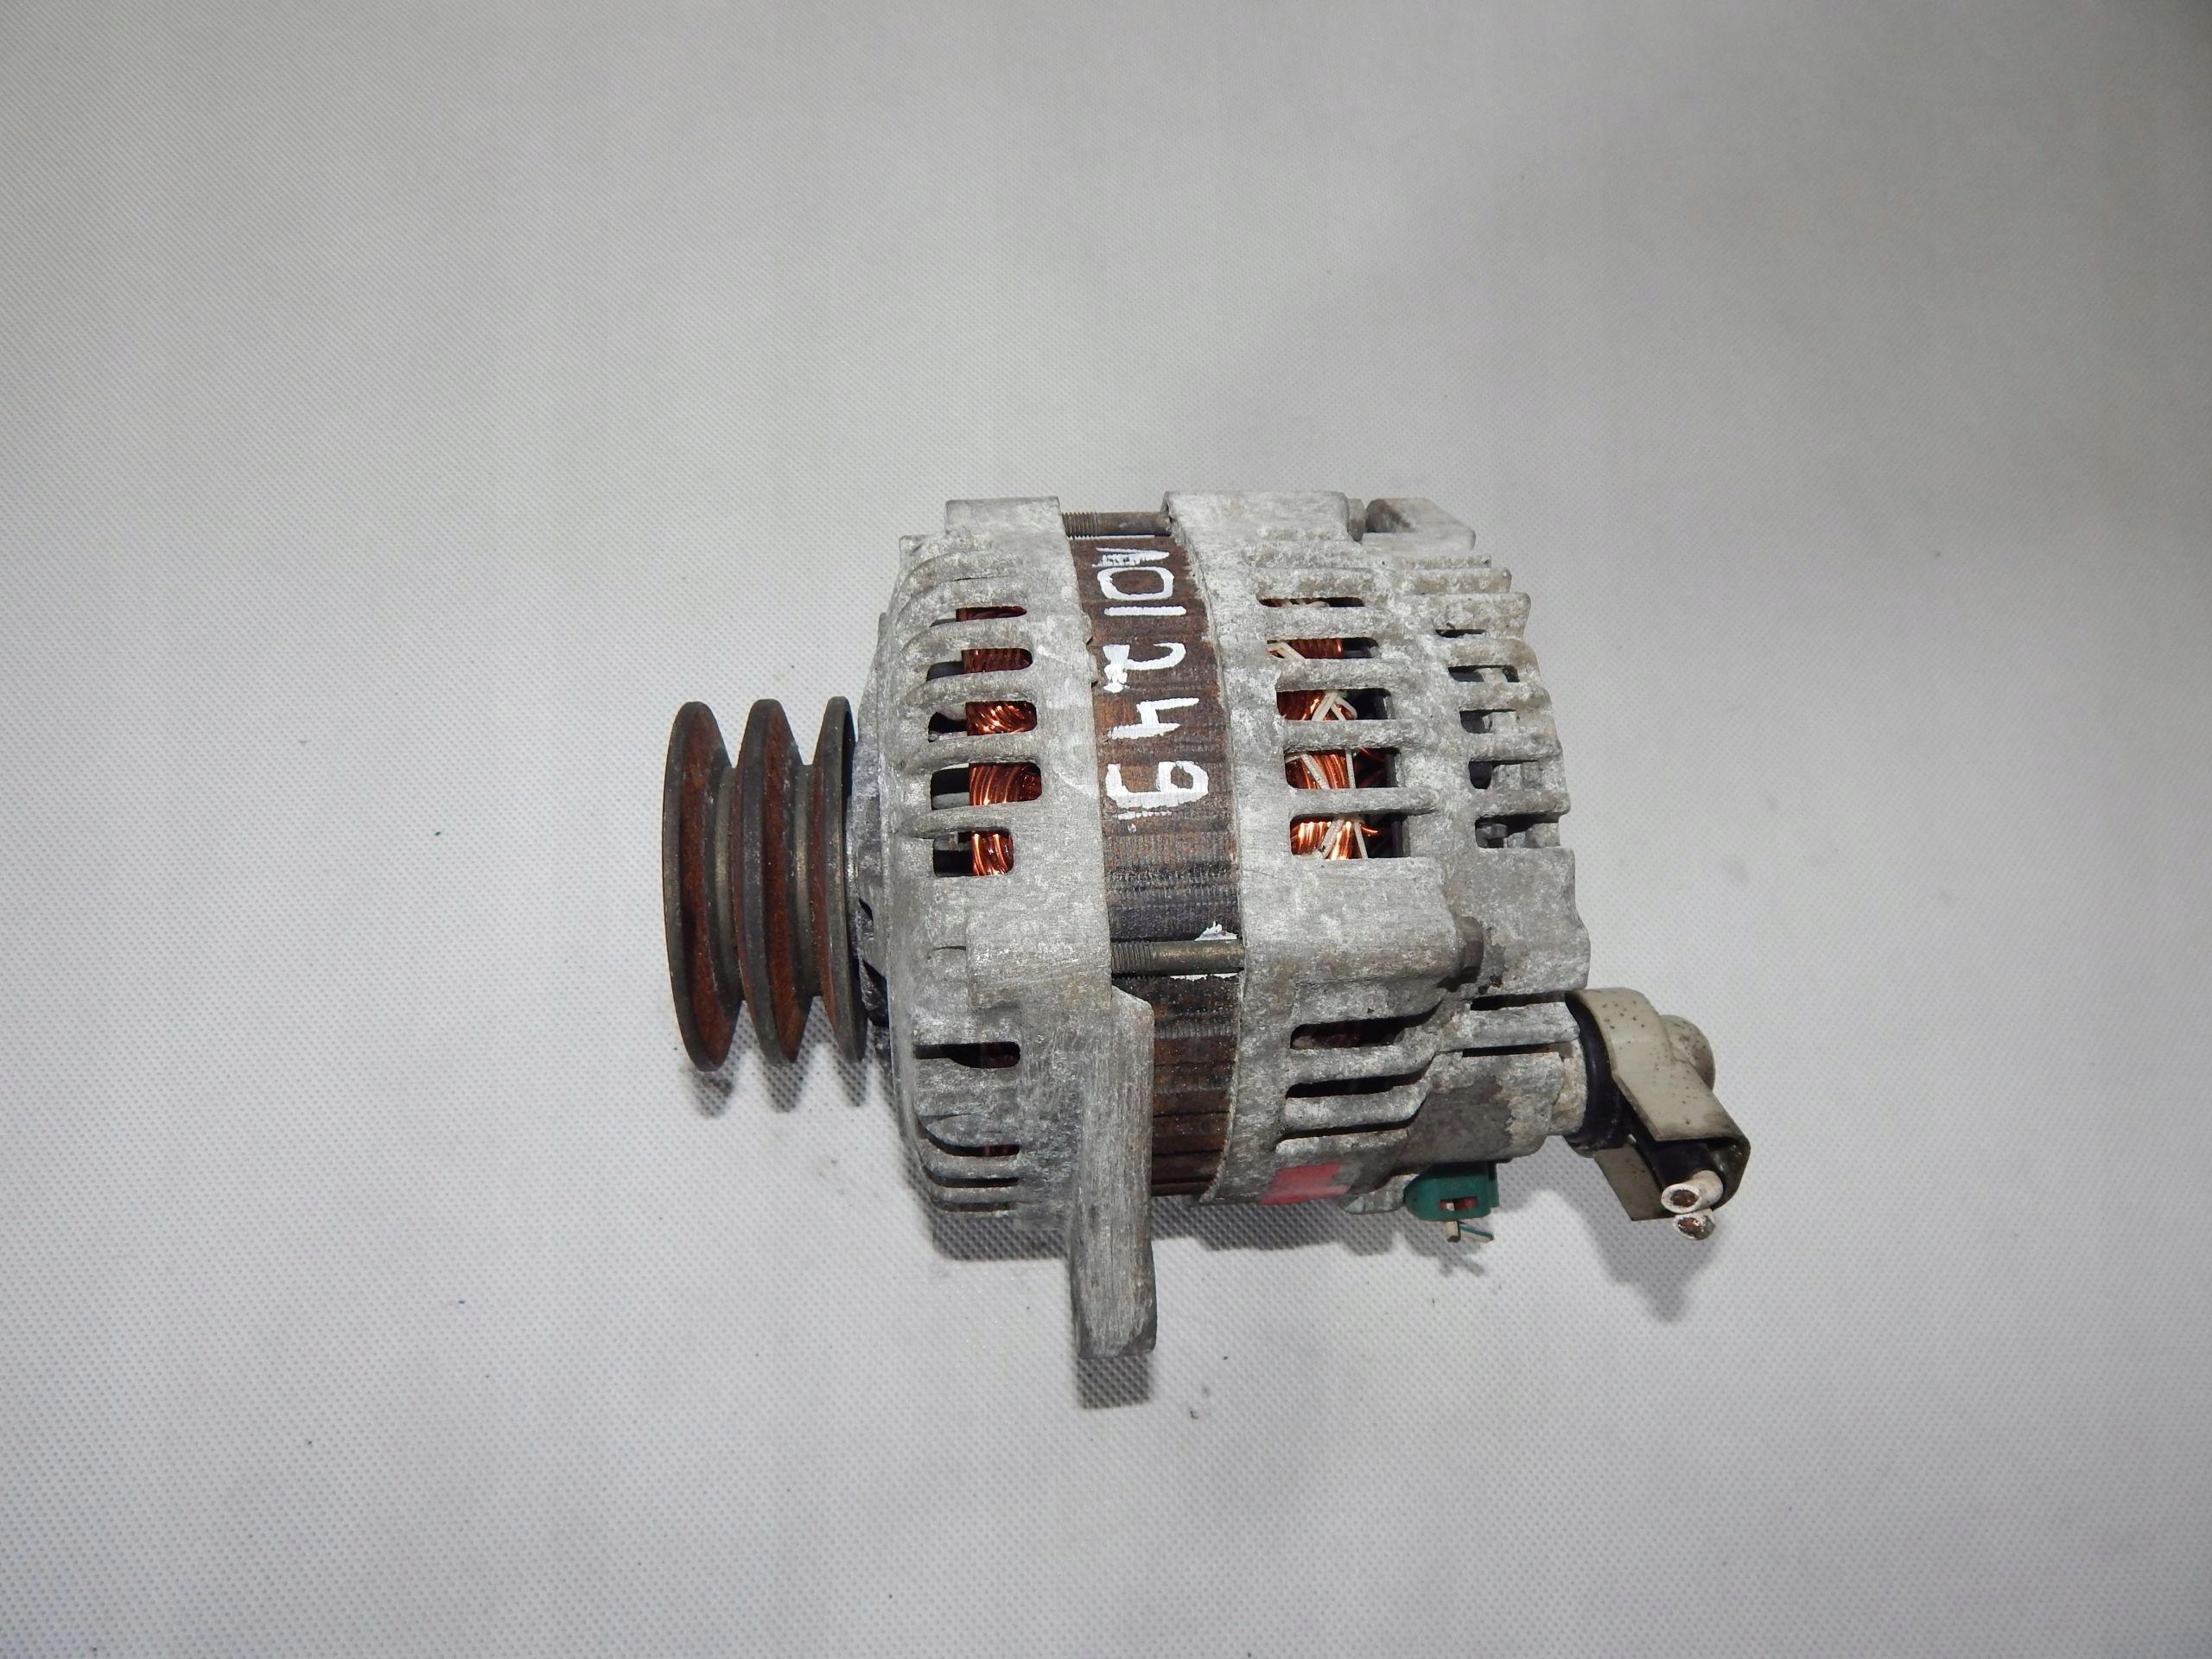 alternator isuzu trooper 3.0 dti 90a 897215-9922 - 7527429455